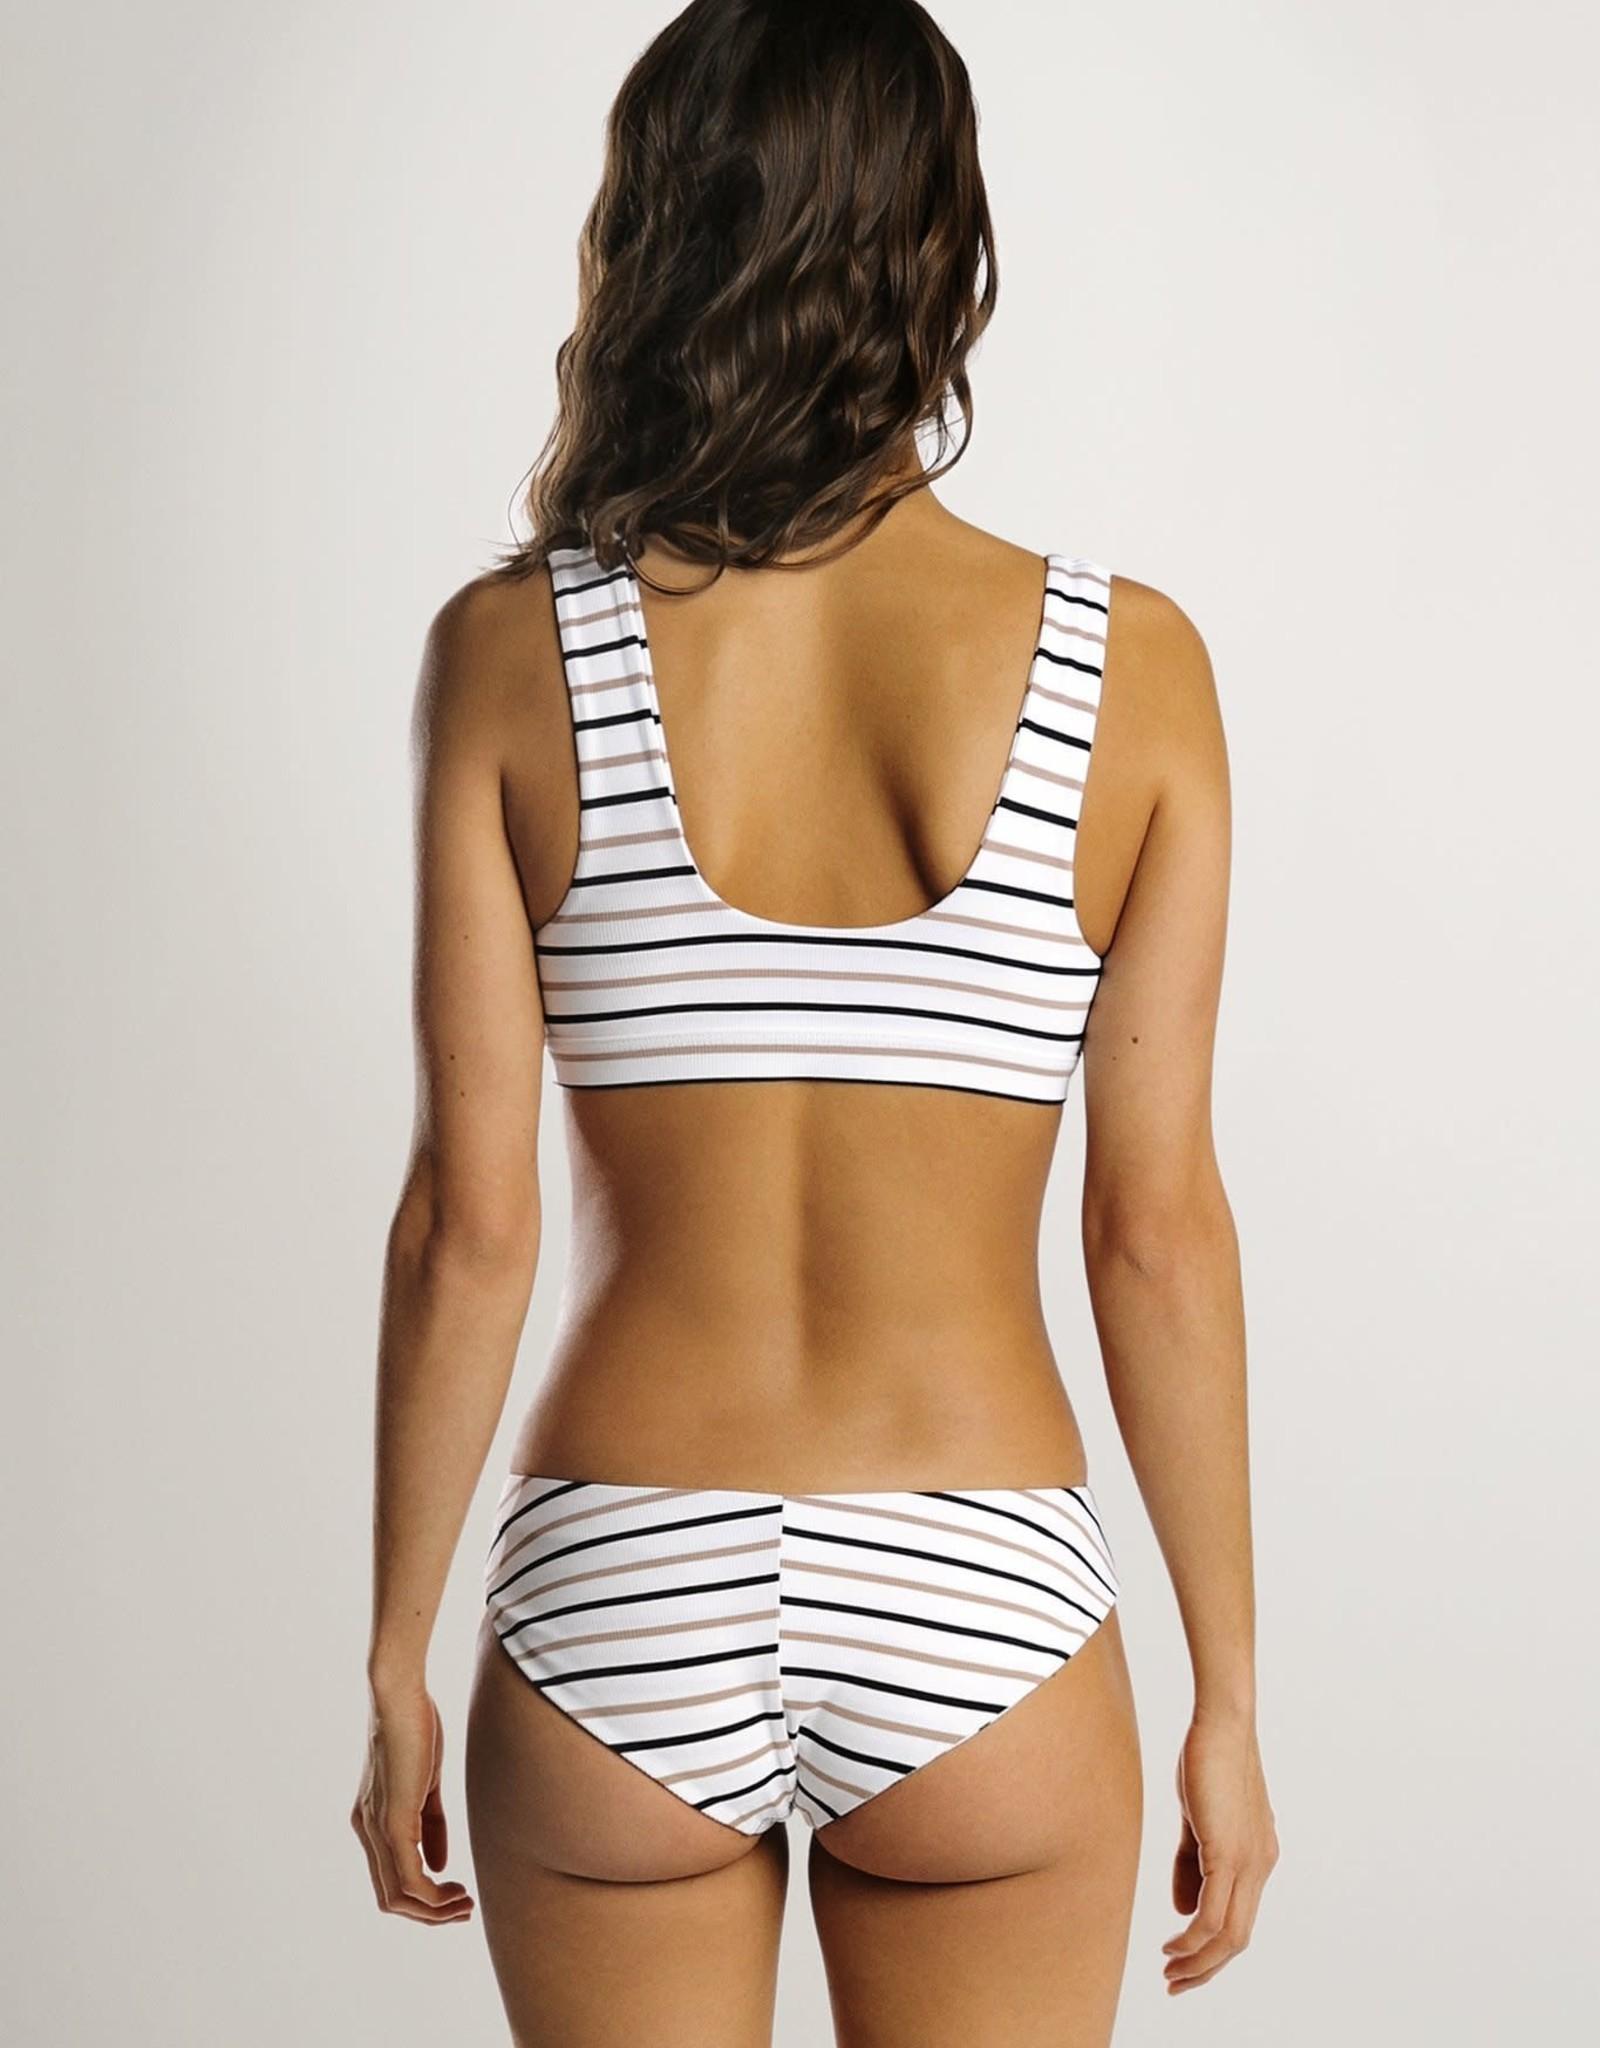 JUNE Swimwear Daisy Bikini Bottom, Stripe